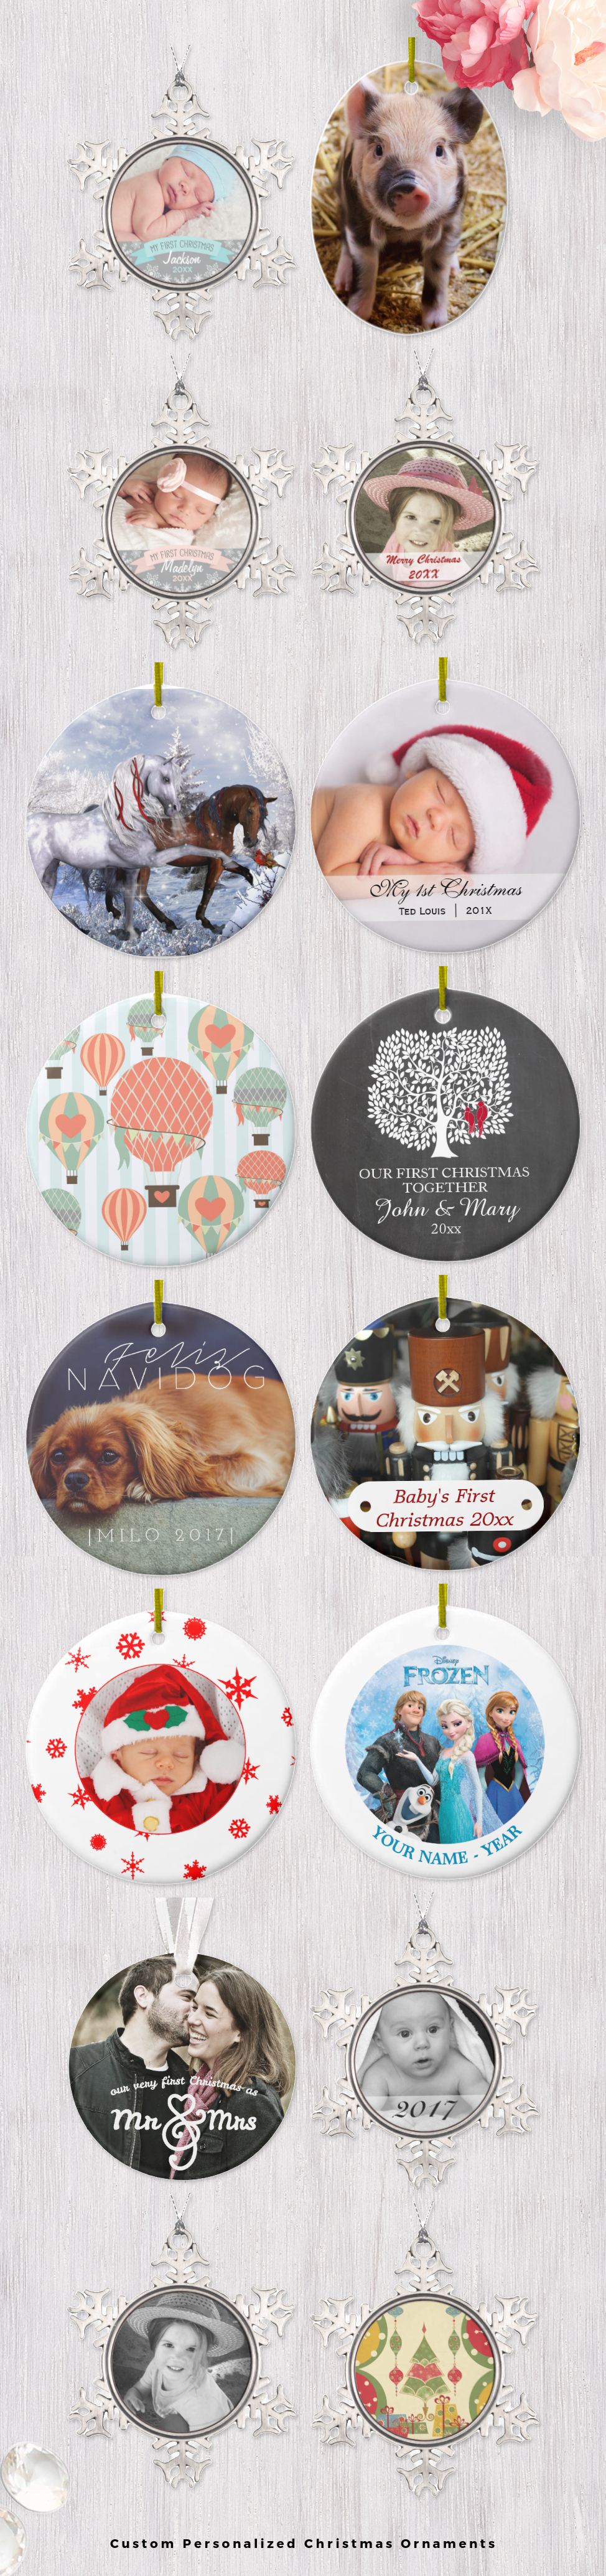 Design your own christmas ornaments - Custom Personalized Christmas Ornaments Design Your Own Christmas Tree Ornaments With Your Own Photos And